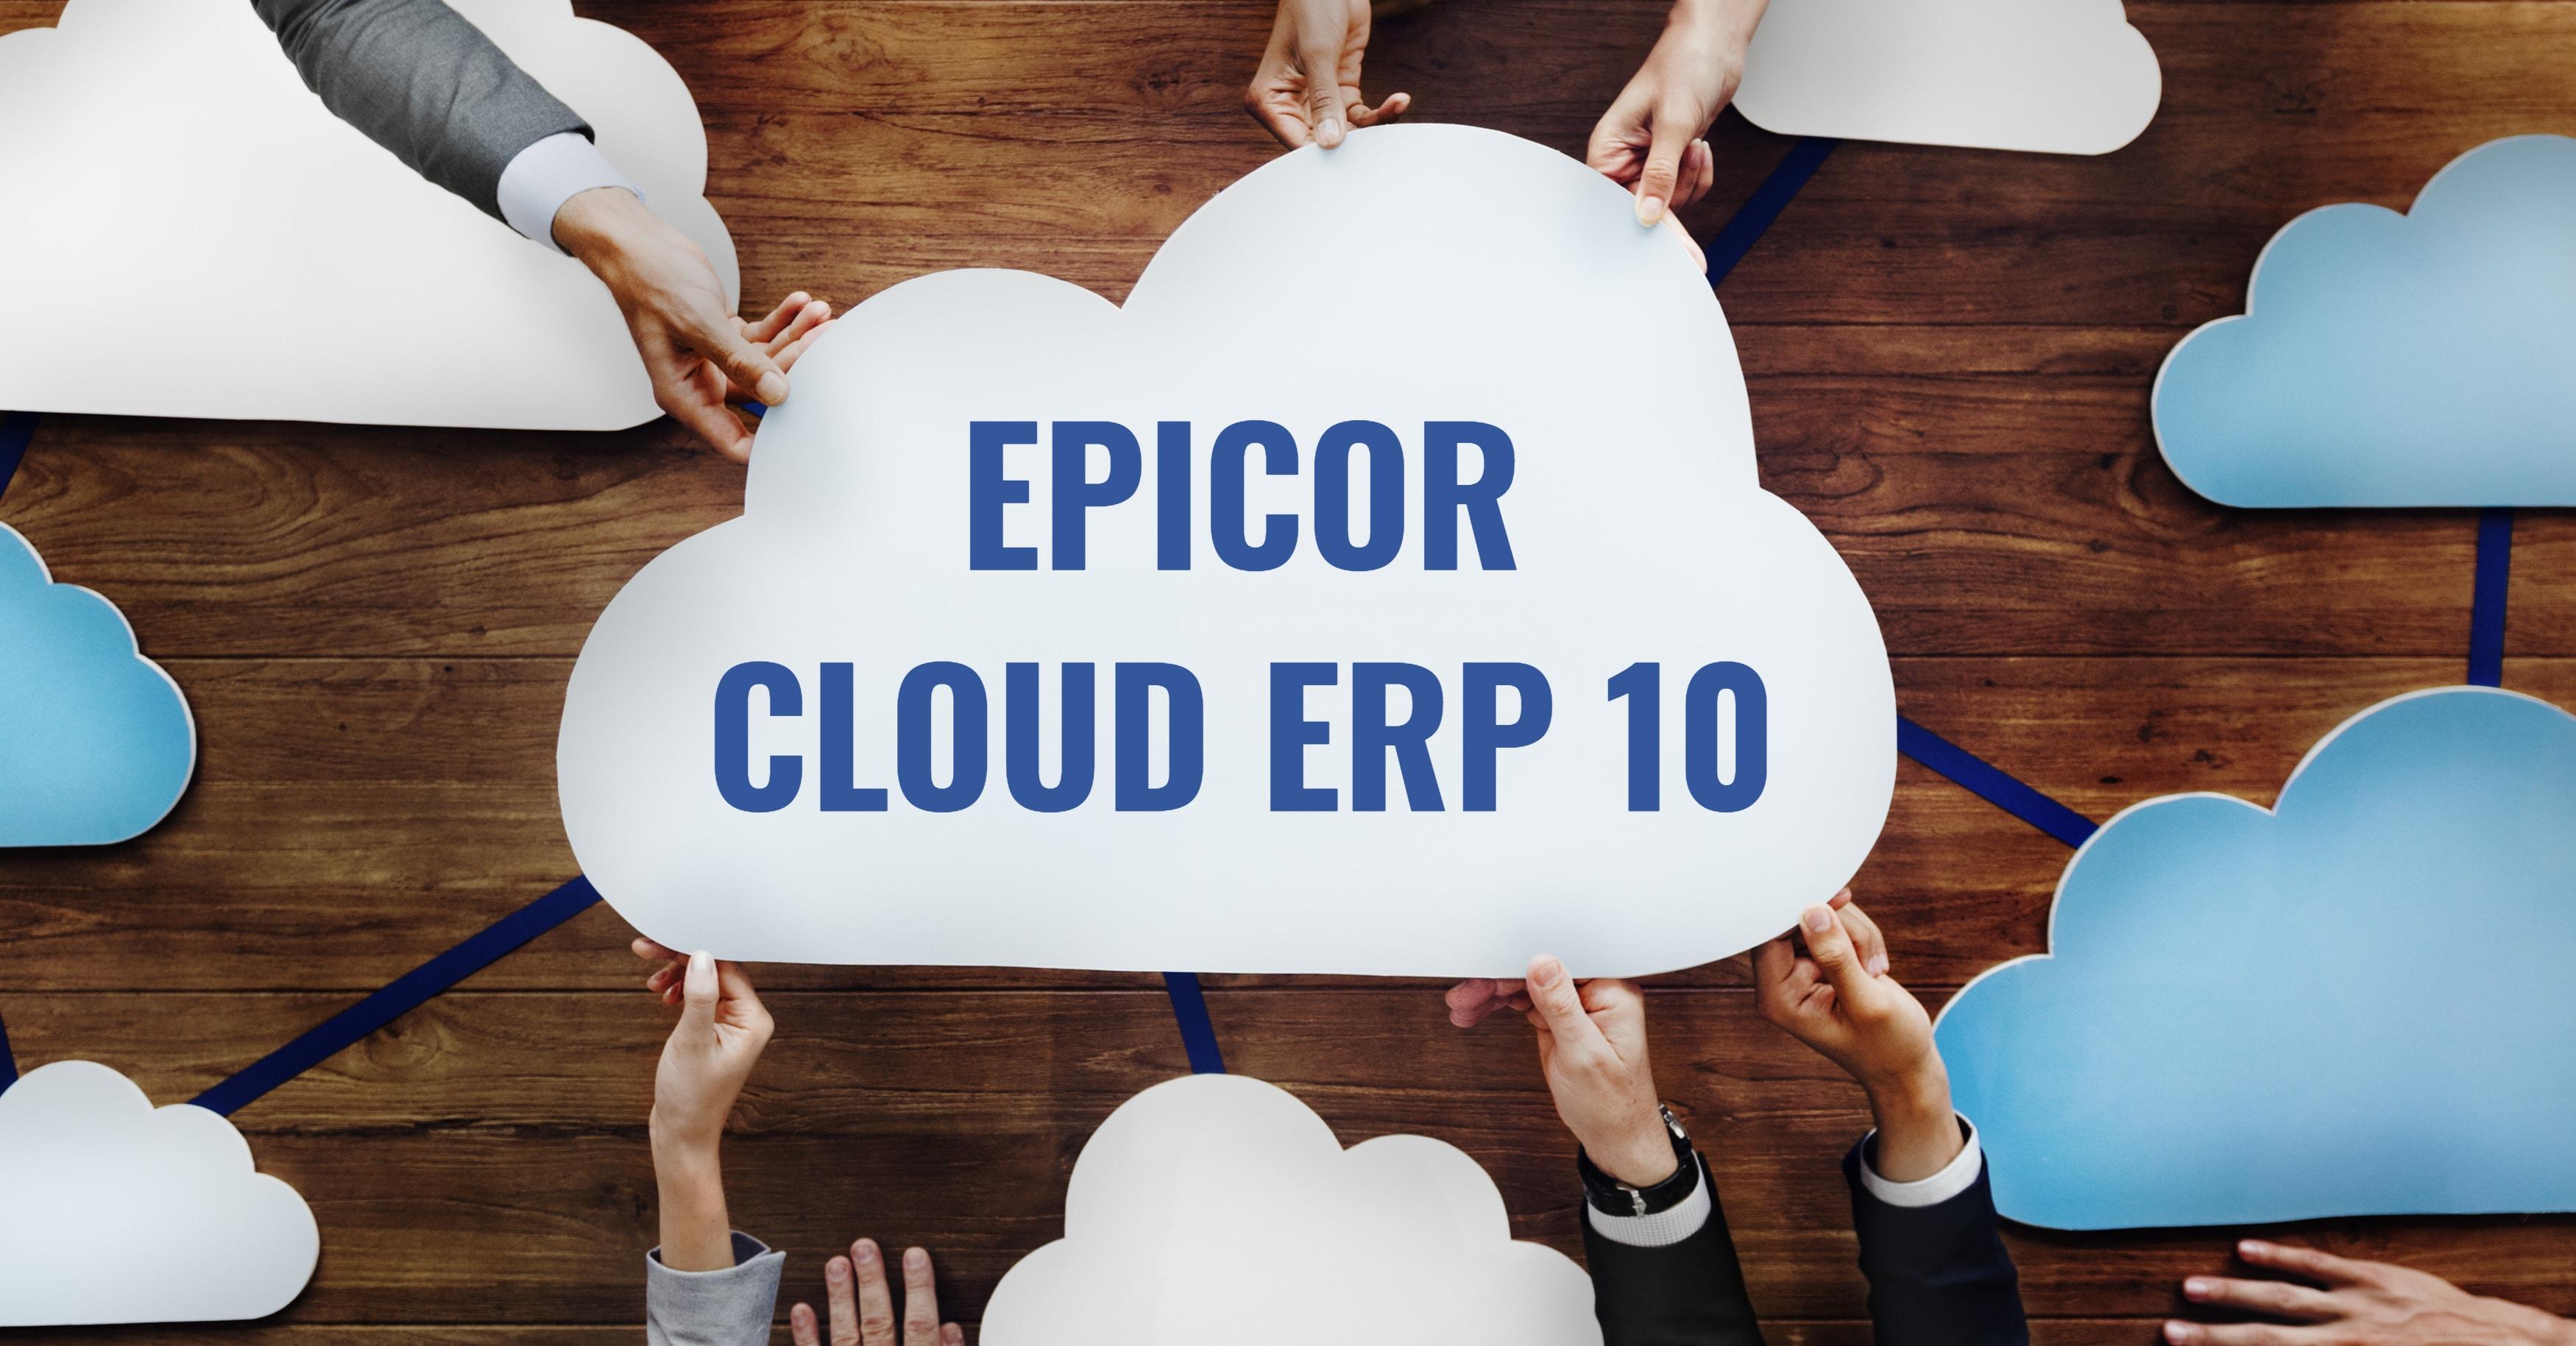 Epicor Cloud ERP 10